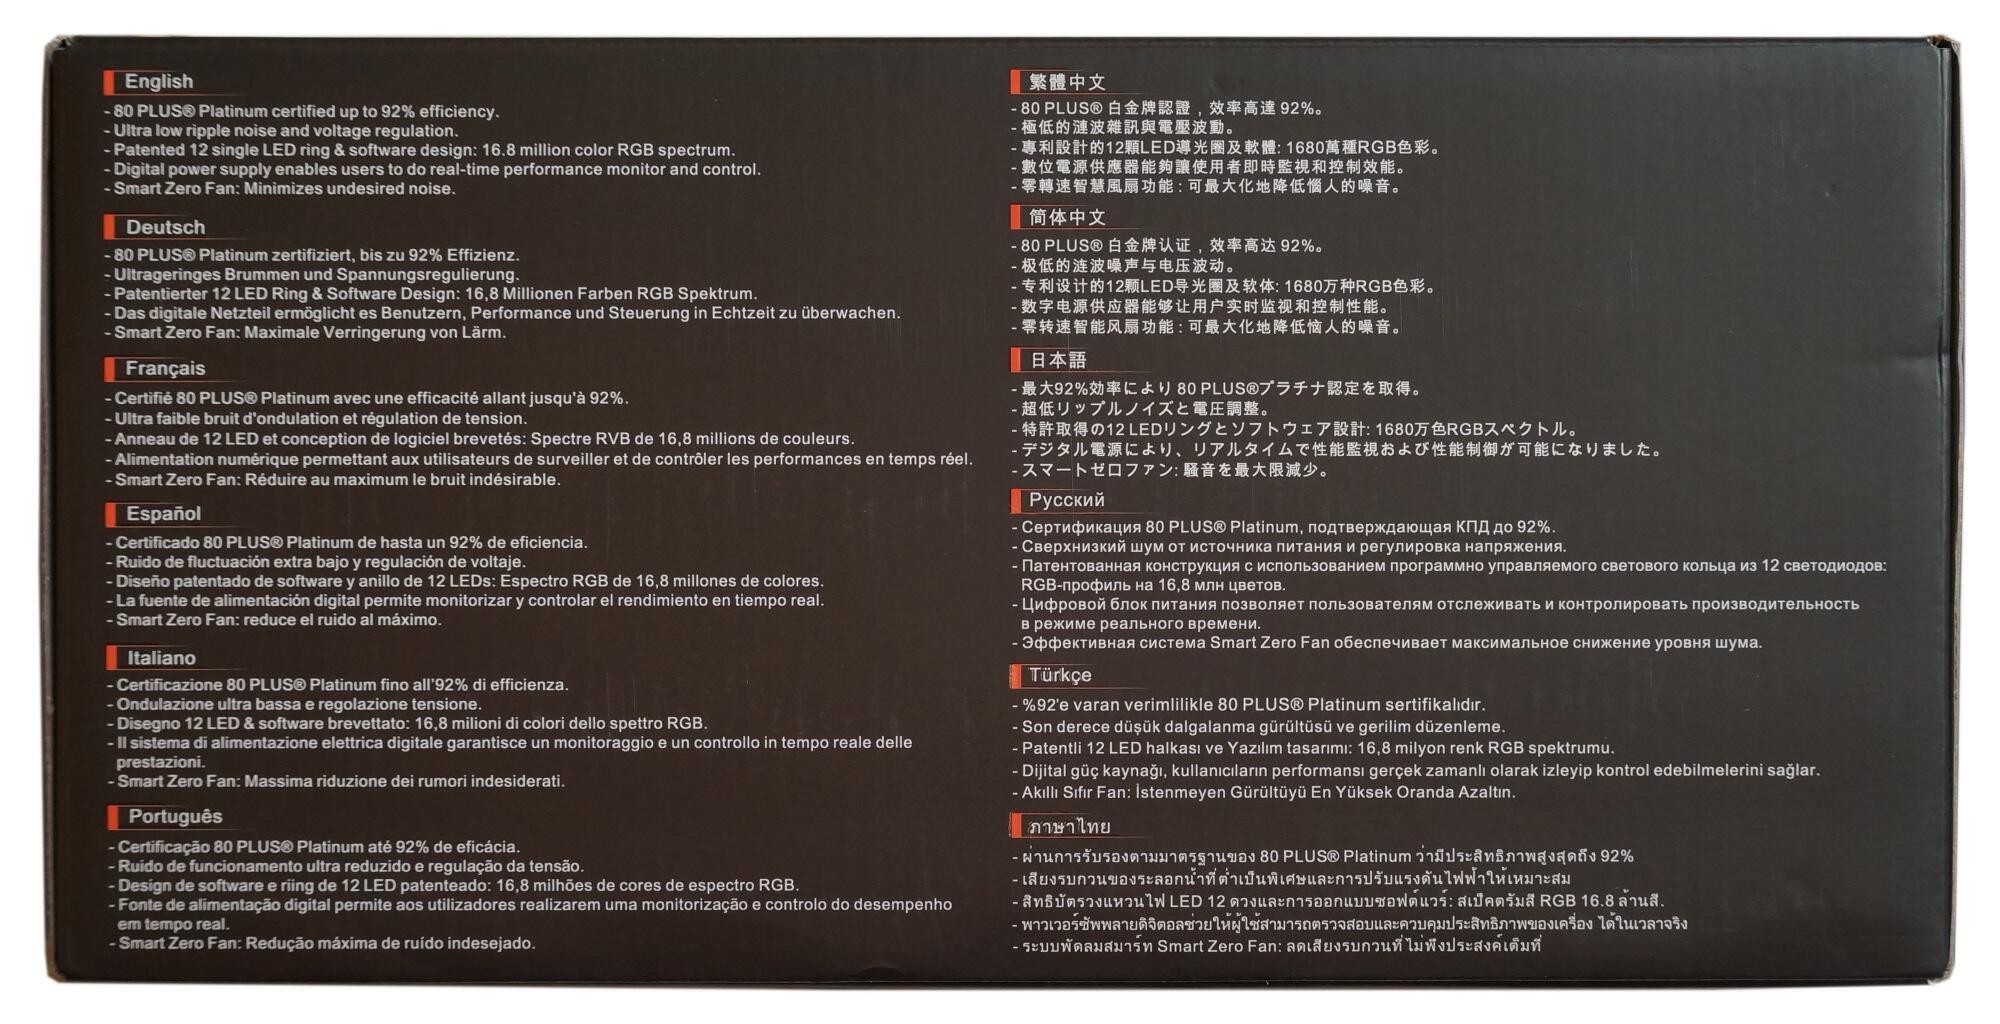 Kompyutery i komplektuyushcie - Obzor bloka pitaniya Thermaltake Toughpower iRGB PLUS 850W